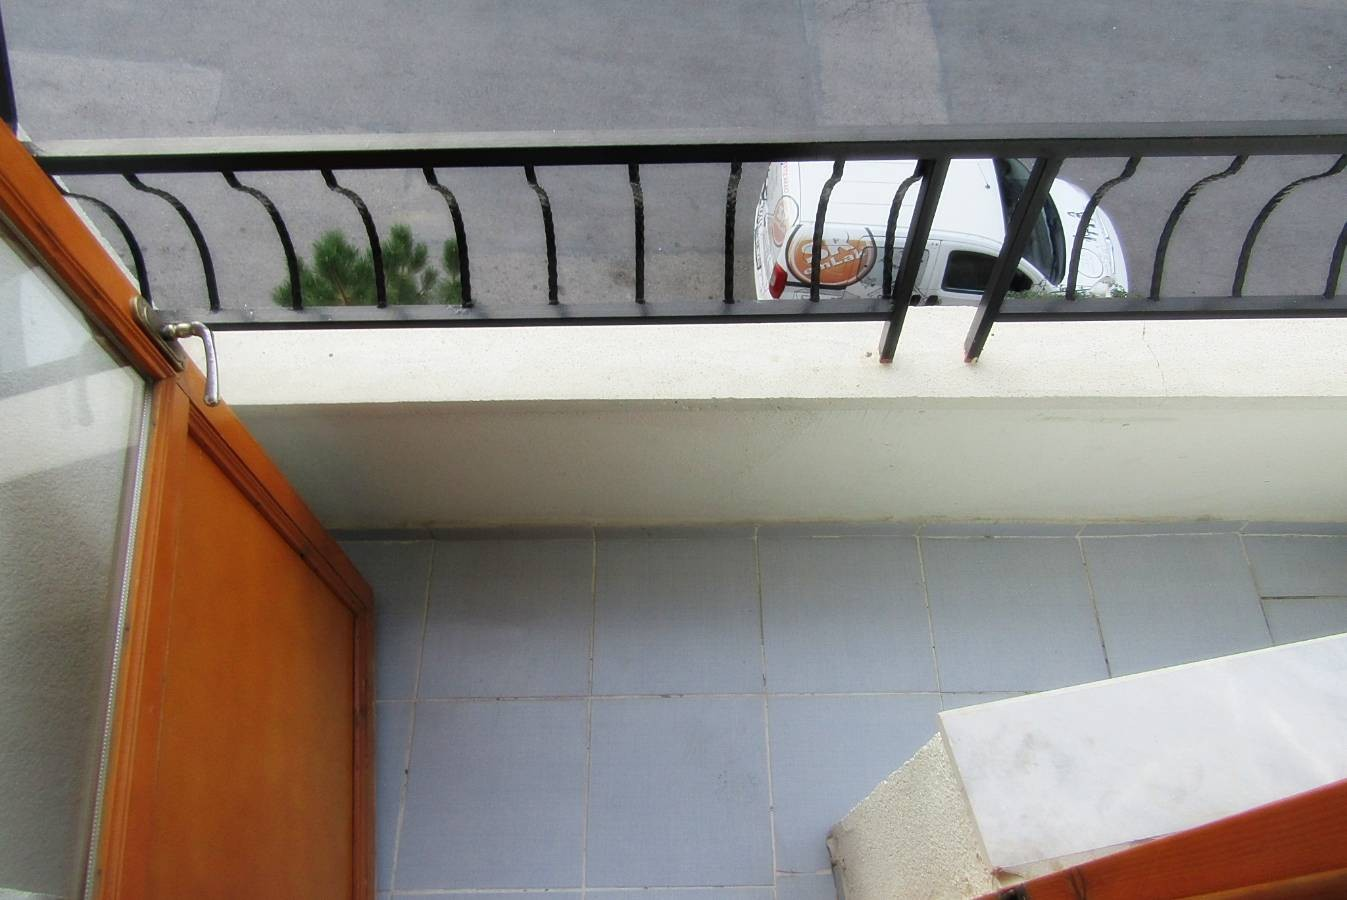 SR EMLAK'TAN PİYADE MAH'DE 3+1 110m² ARA KATTA ÖN CEPHE DAİRE